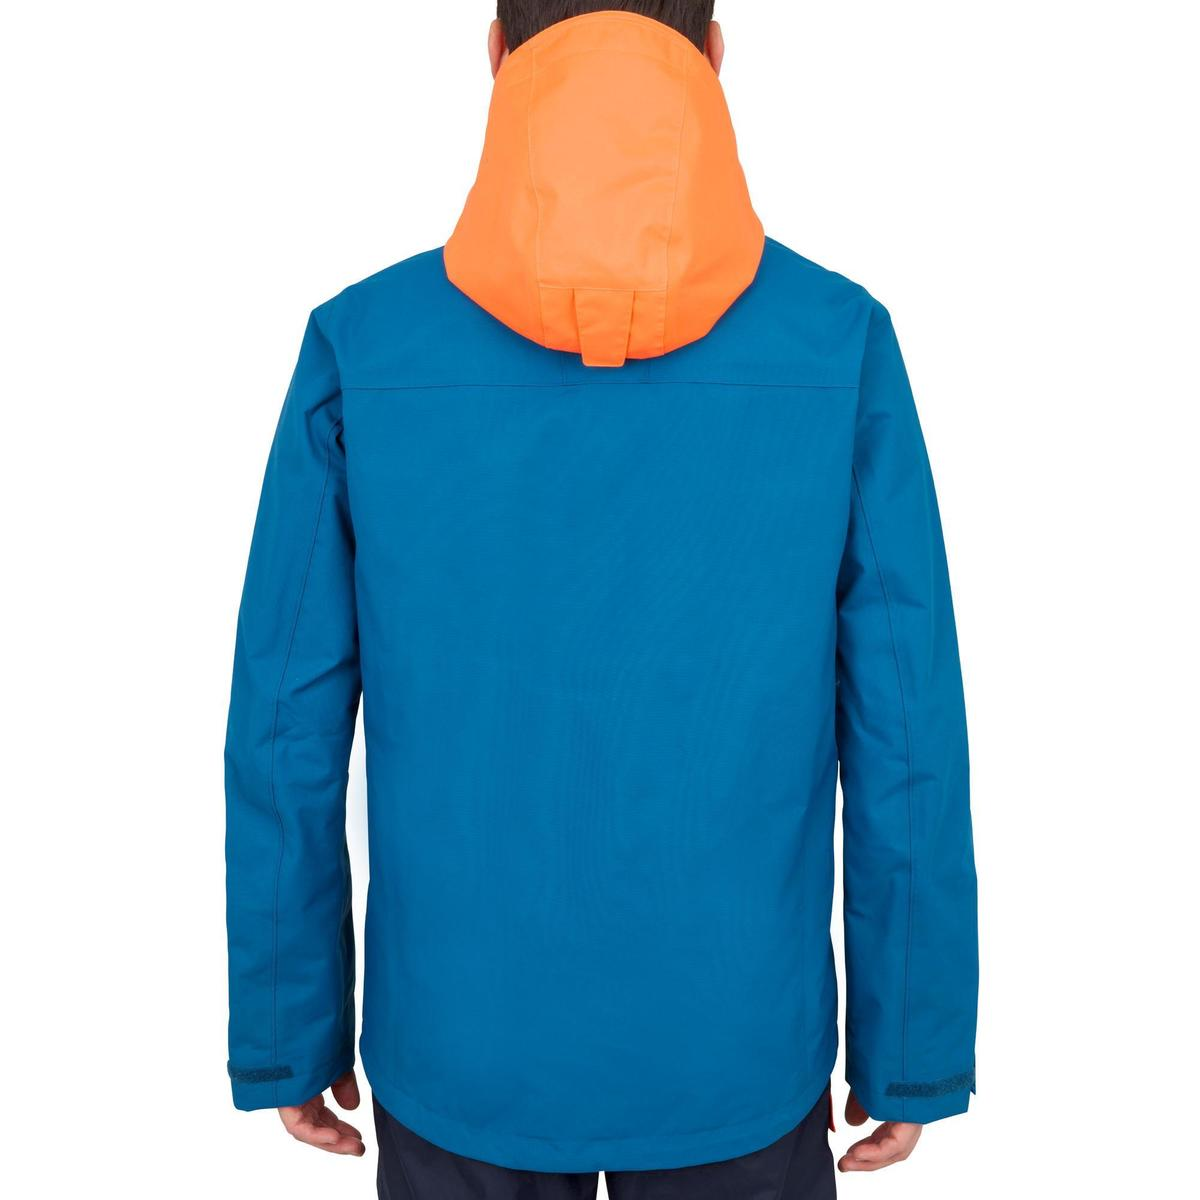 Bild 3 von Segeljacke wasserdicht Inshore 100 Herren blau/orange